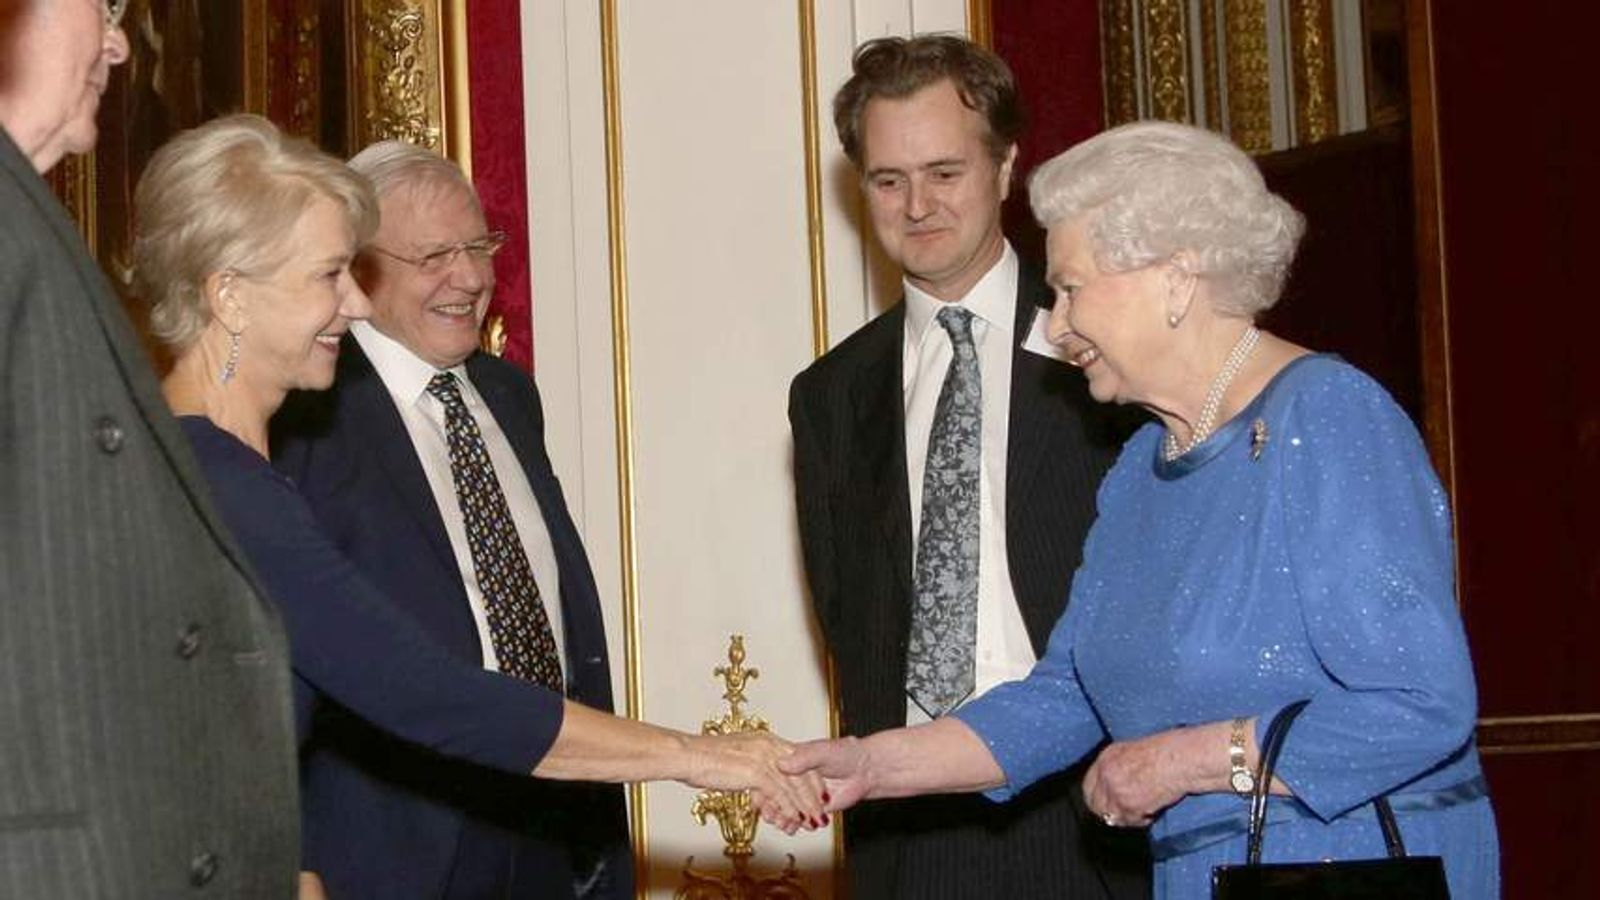 Buckingham Palace reception for the Dramatic Arts